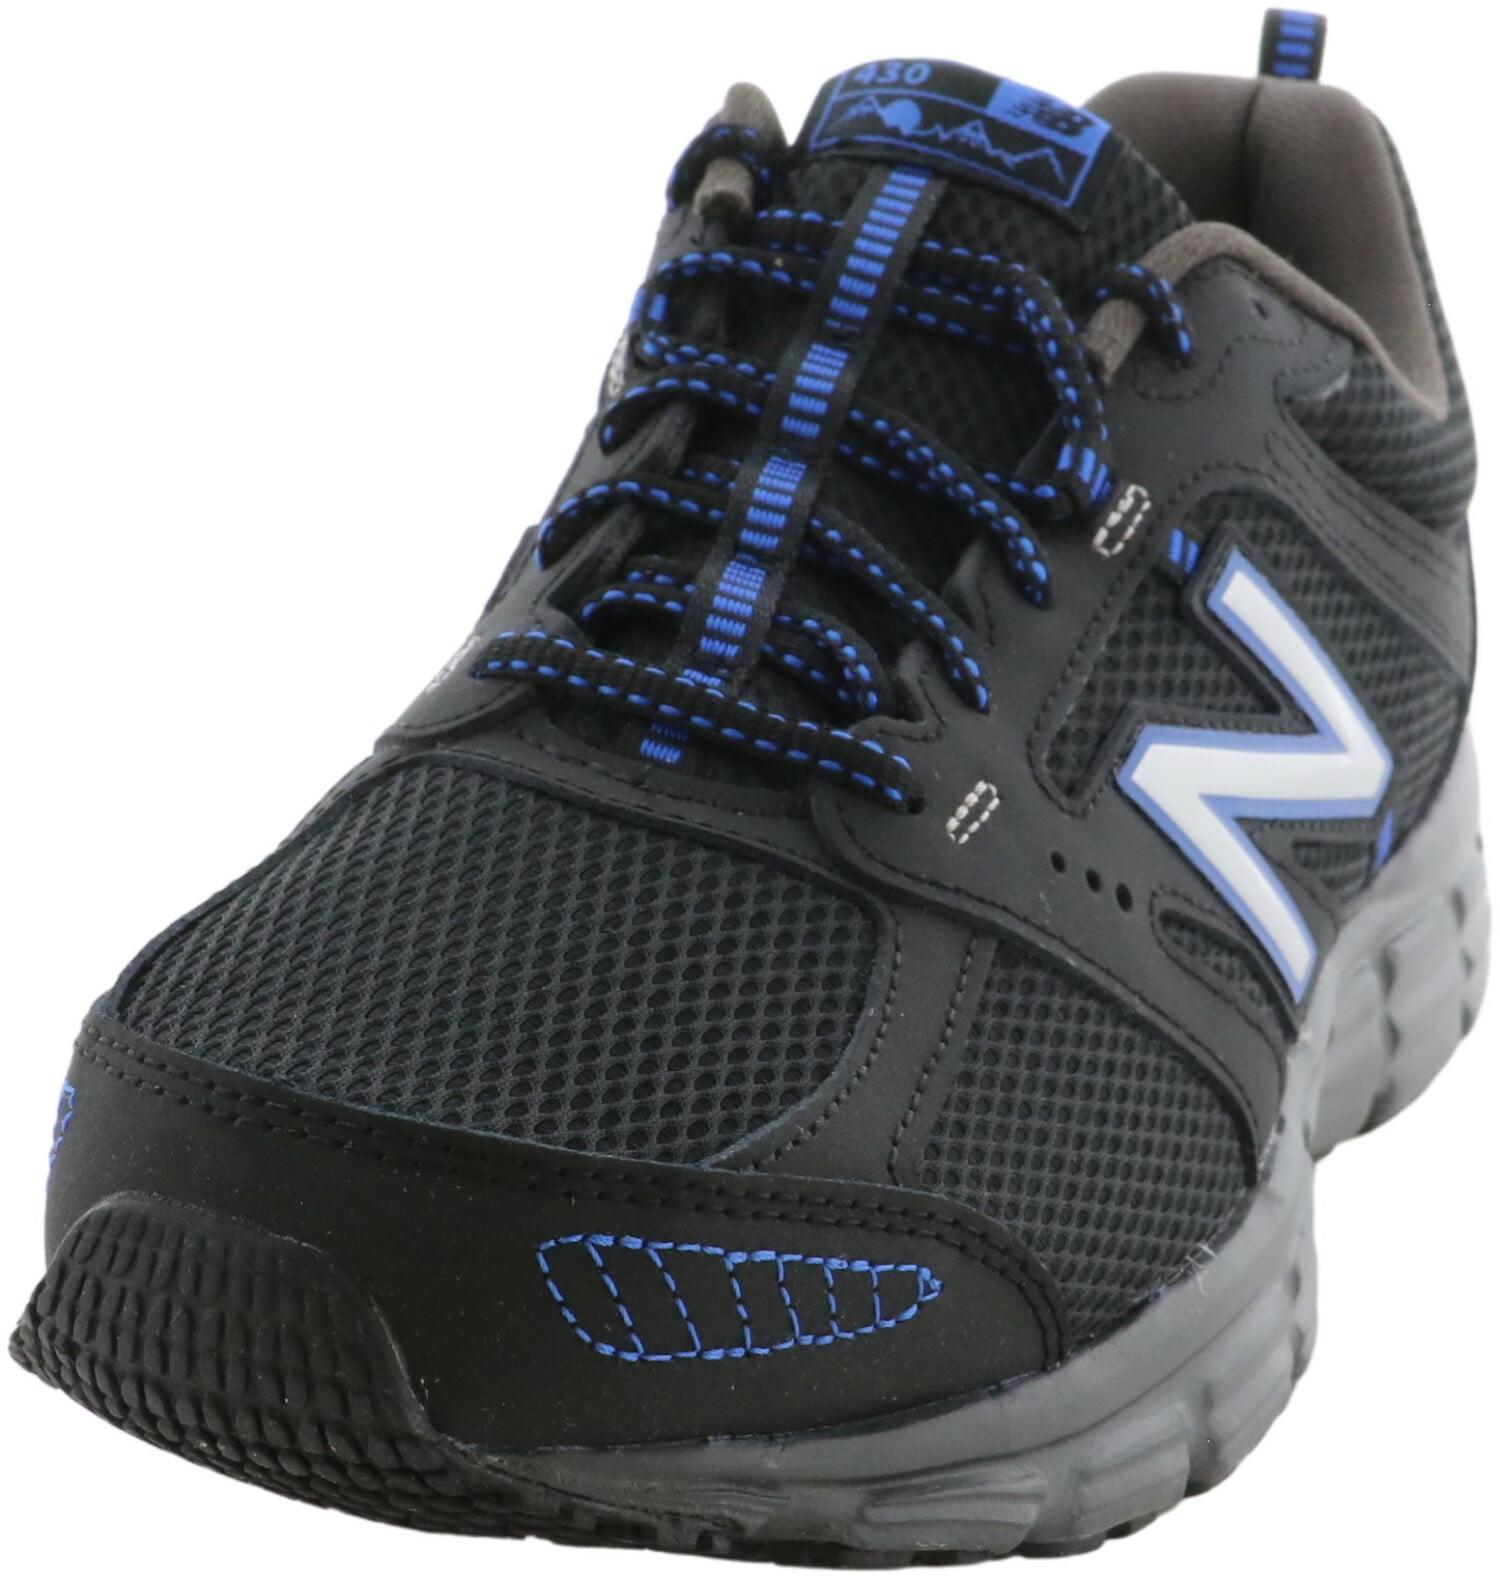 New Balance Men's M430 Lb1 Ankle-High